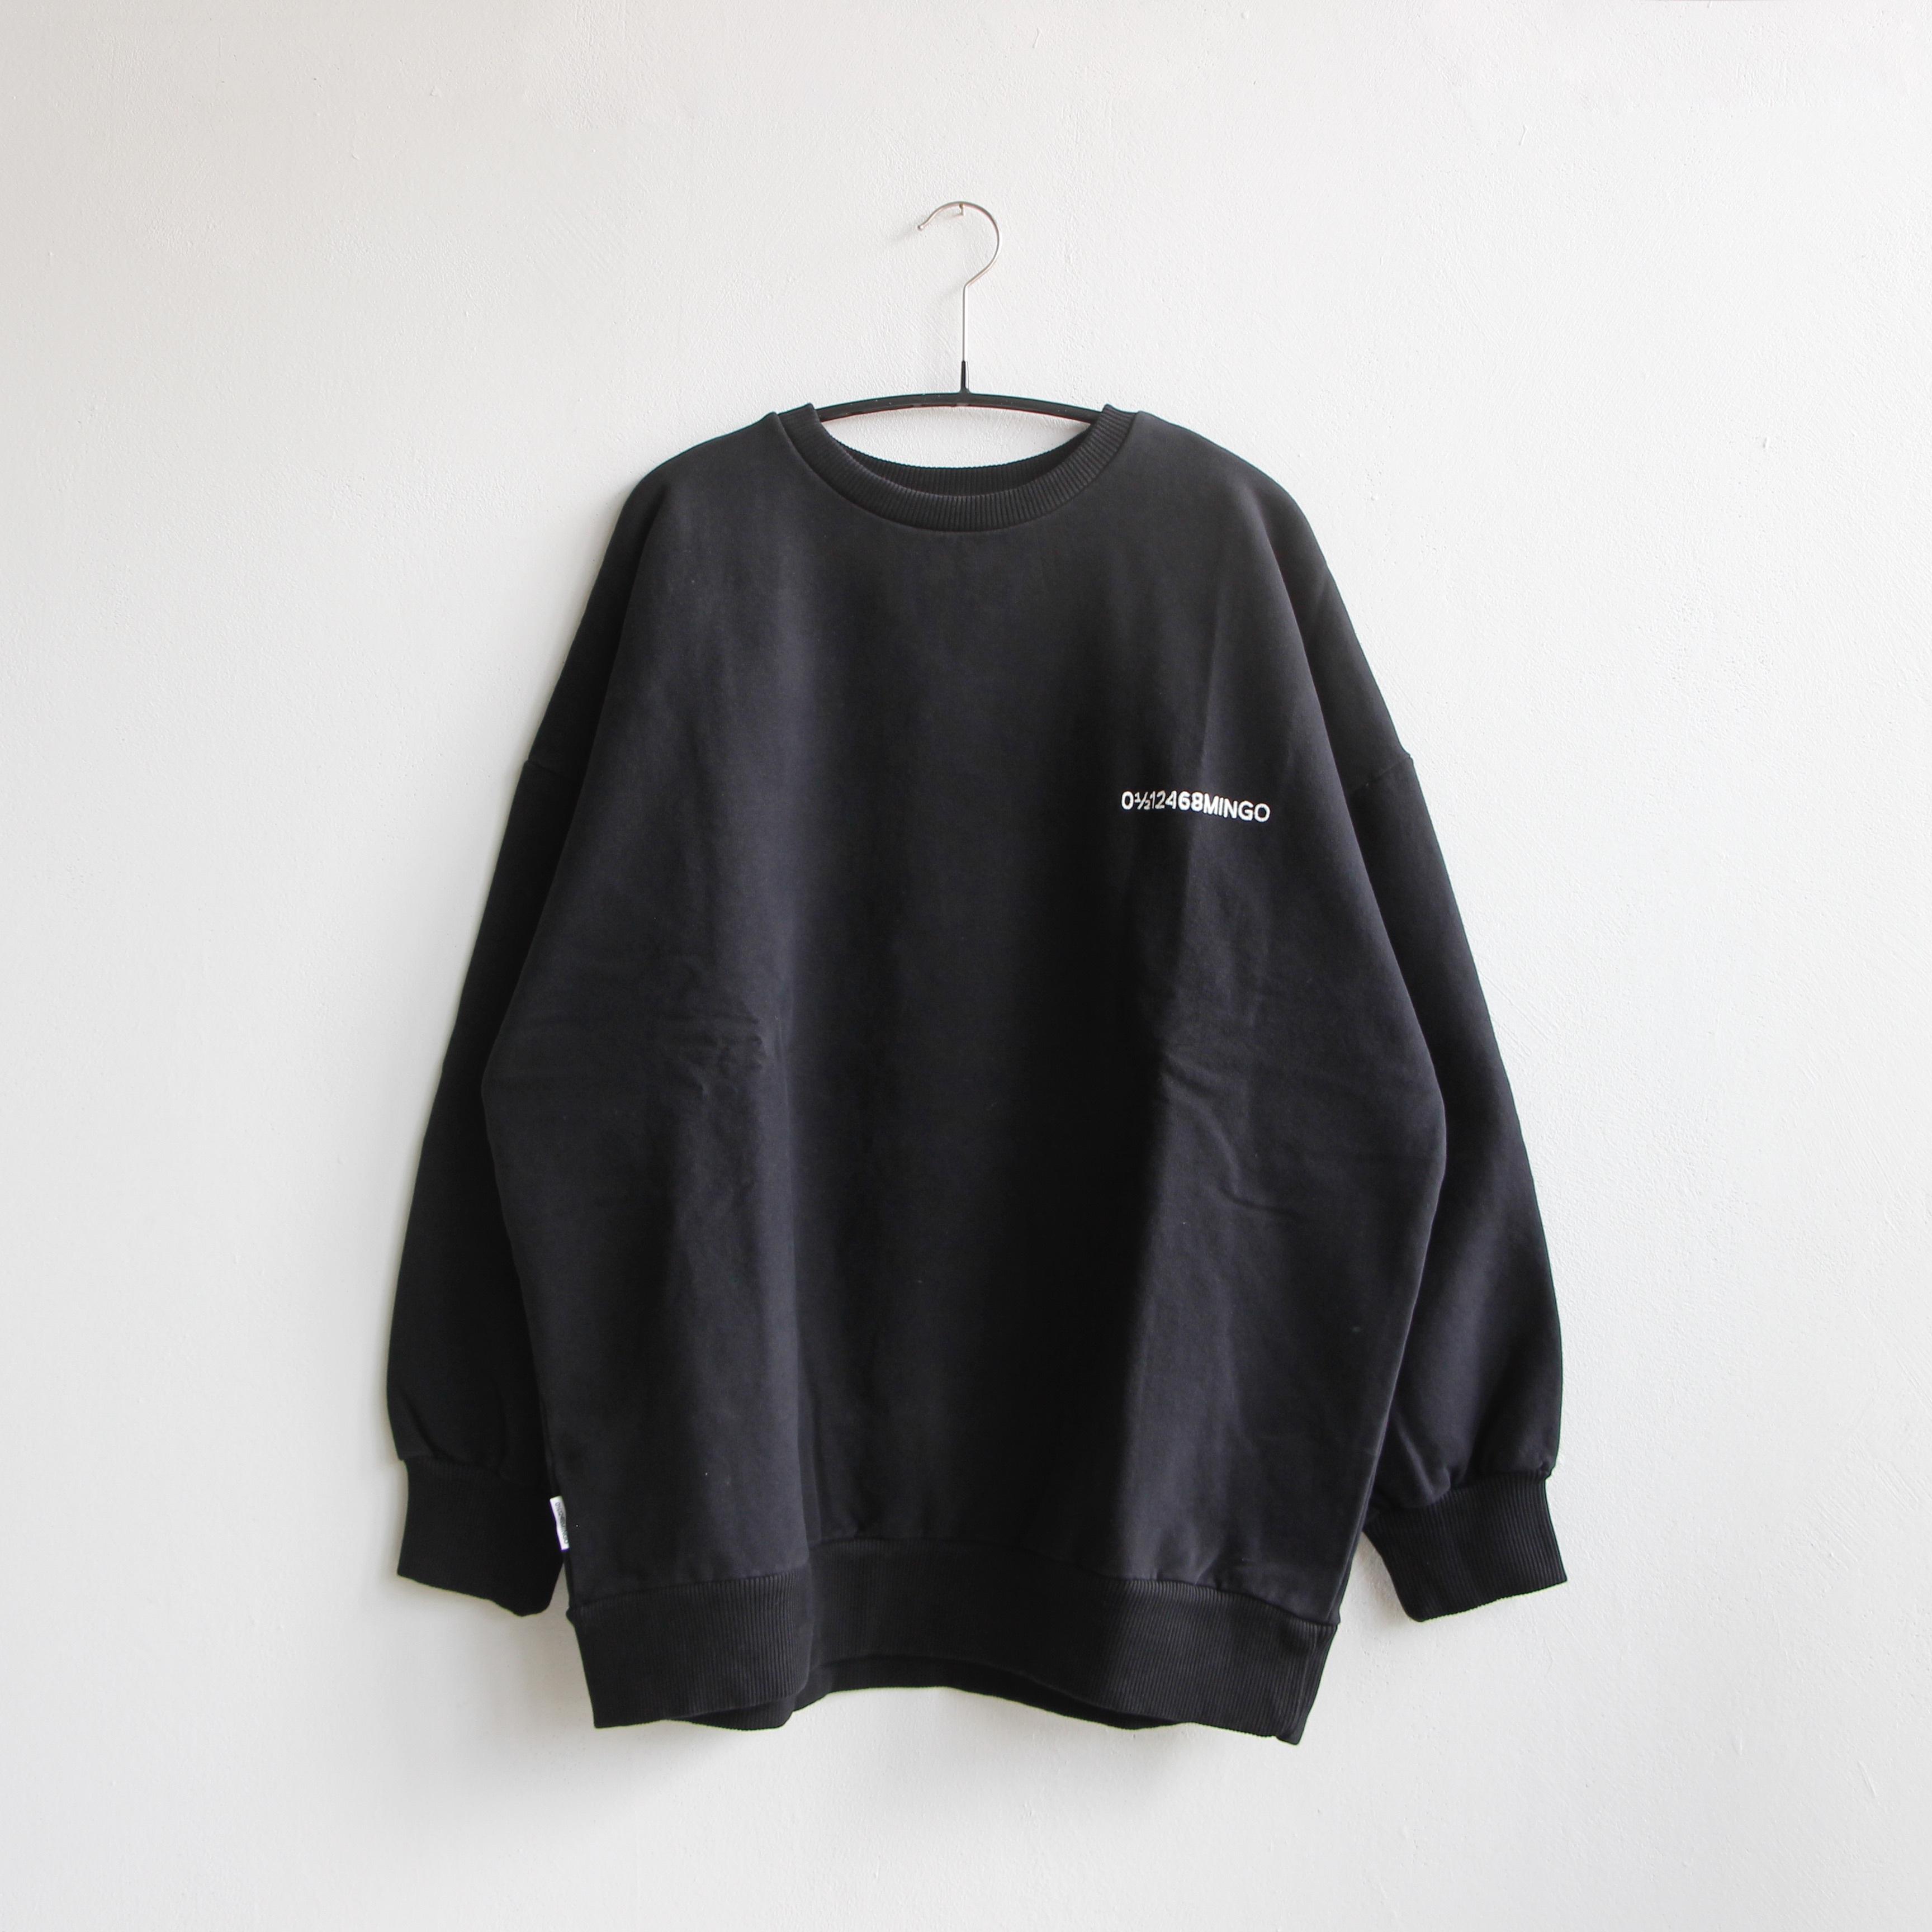 《MINGO. 2020AW》Sweater / logo black / adult